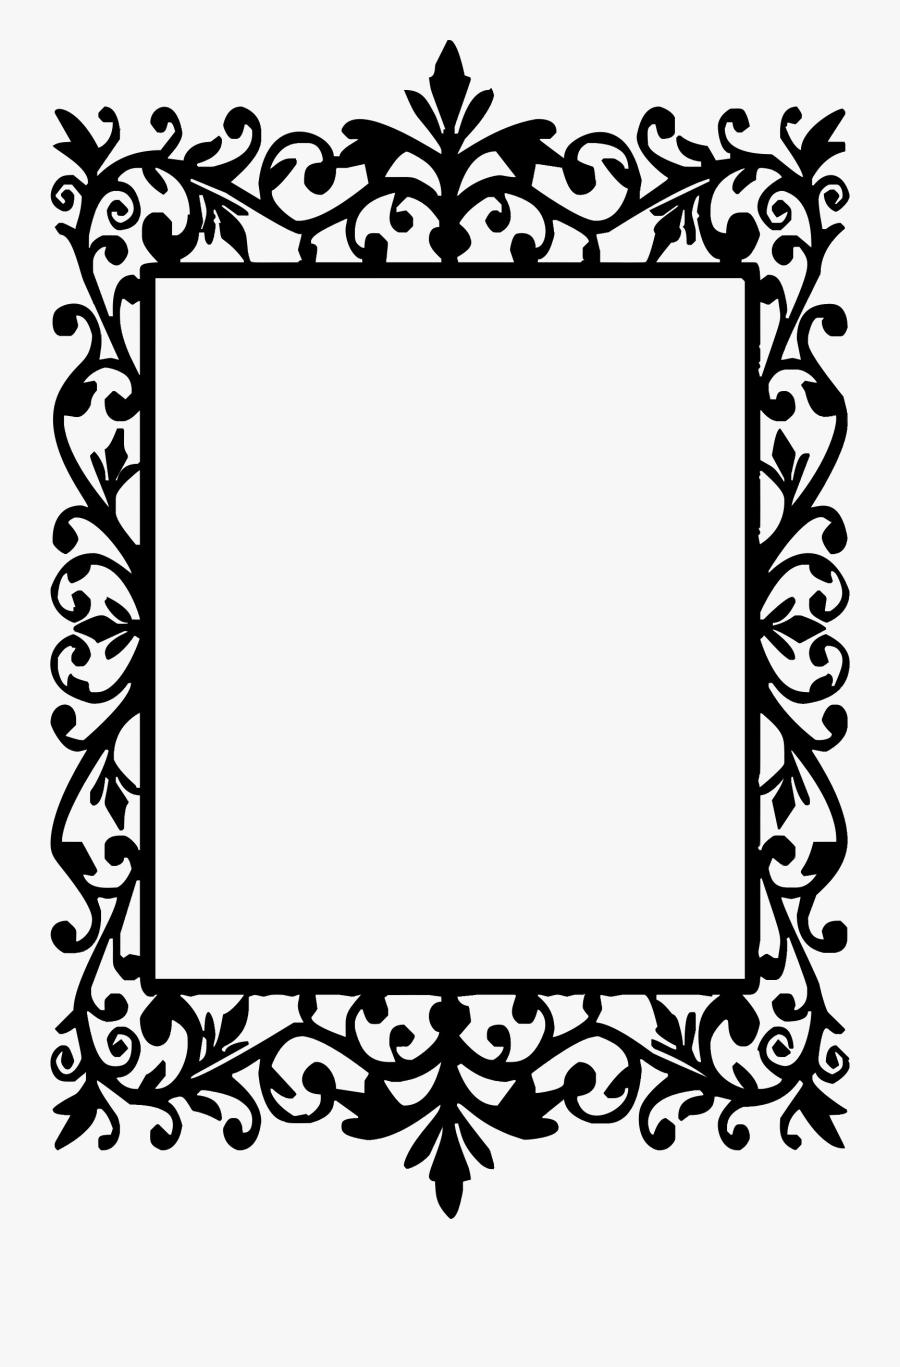 Vector Border Designs Png Clipart - Vintage Frame, Transparent Clipart